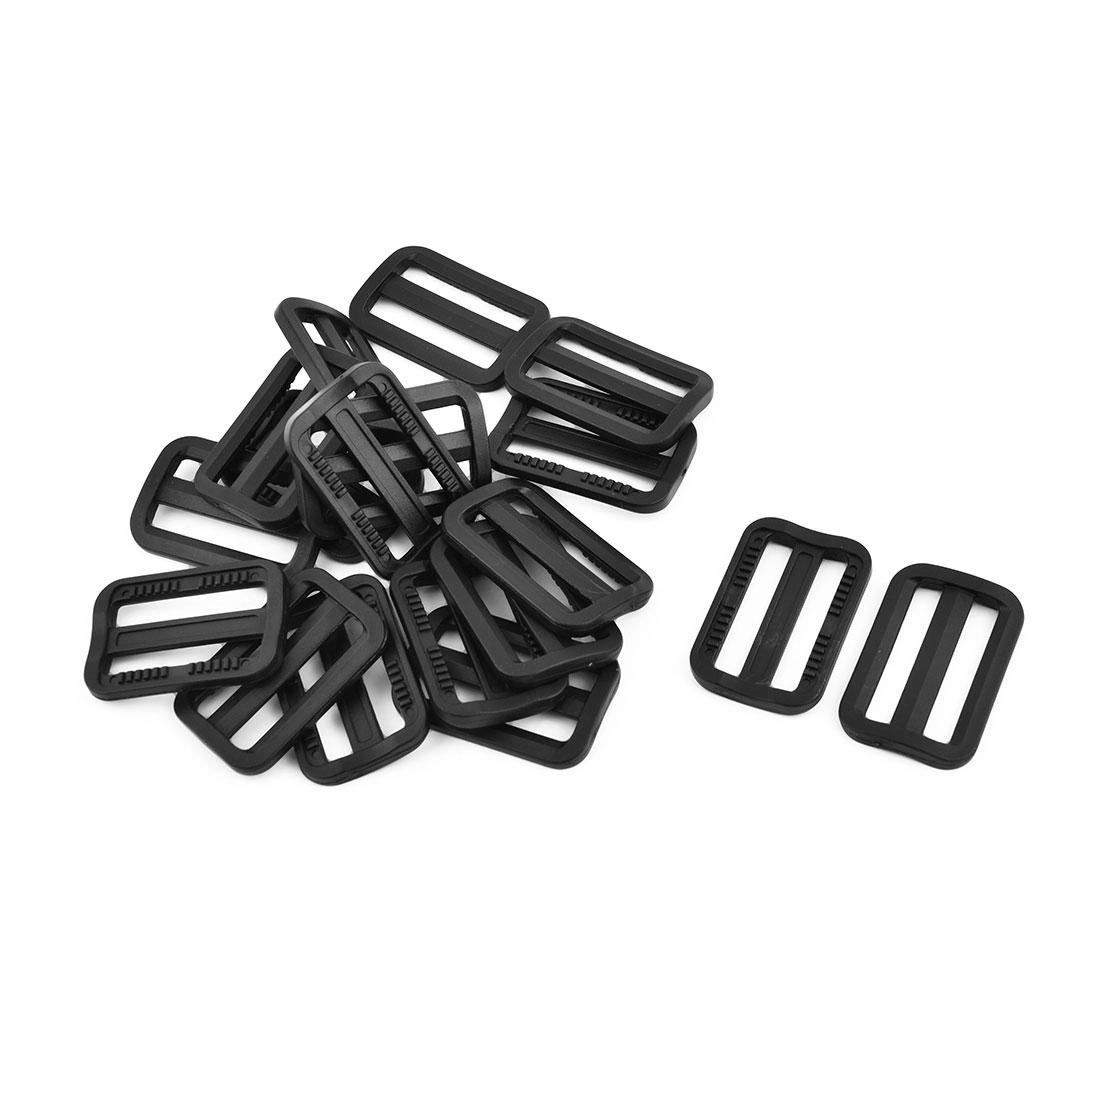 Plastic Adjustable Backpack Bag Tension Tri Glide Connecting Buckle Black 18 Pcs